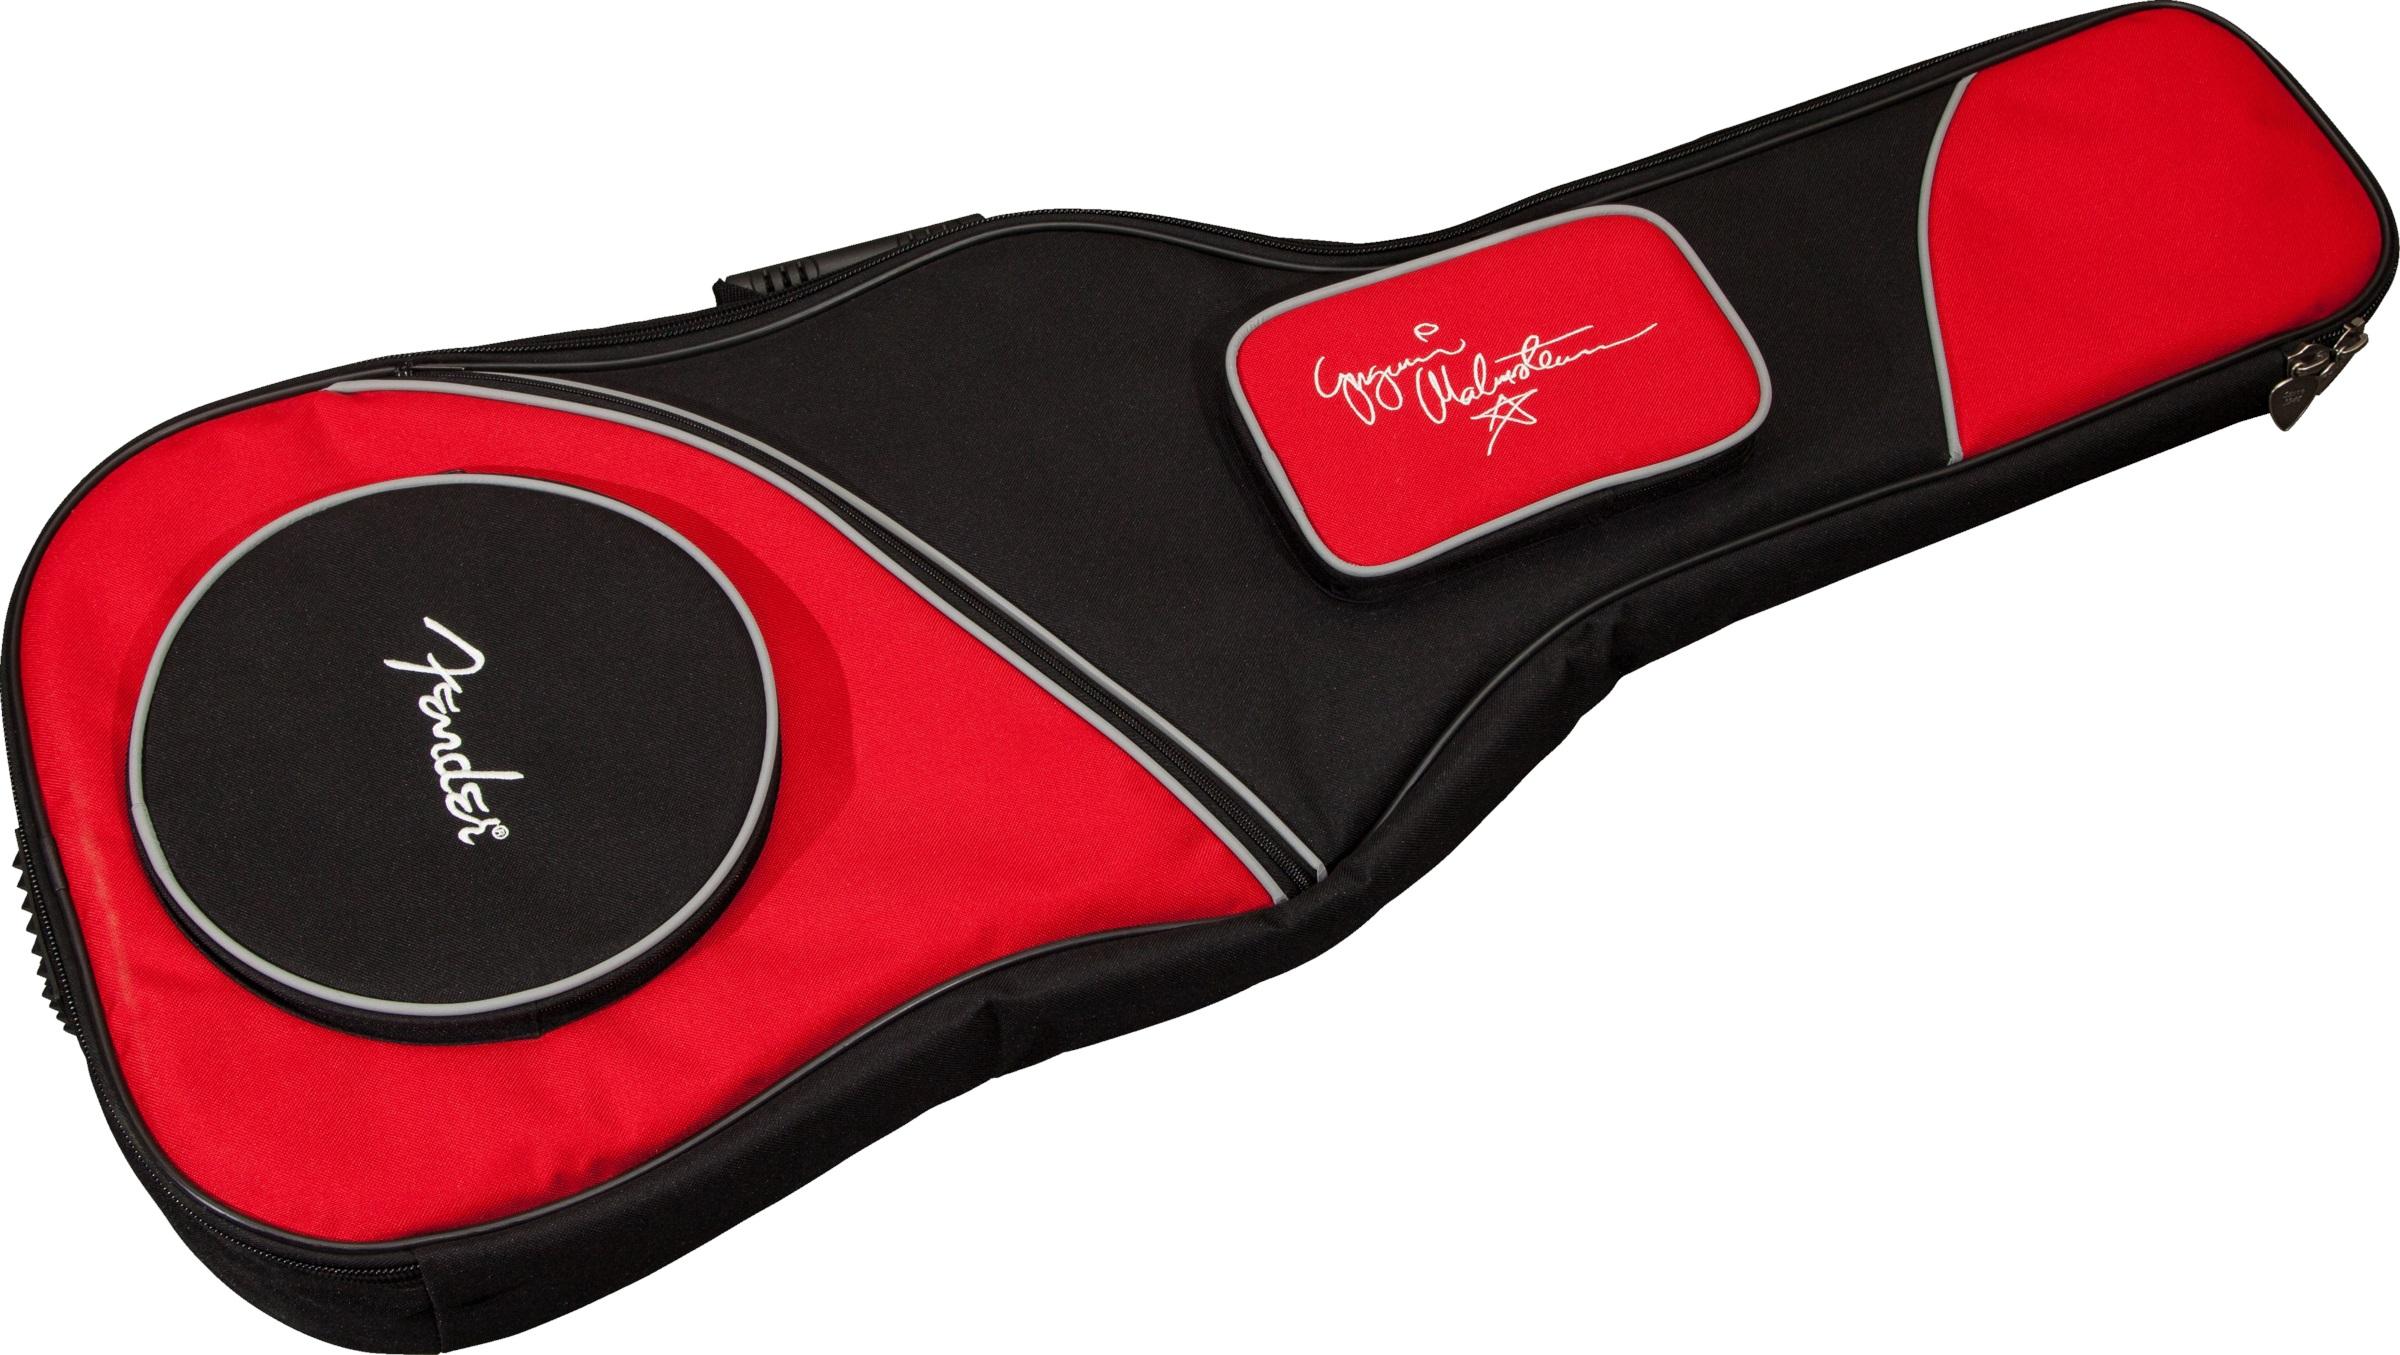 Fender Yngwie Malmsteen Signature Gig Bag